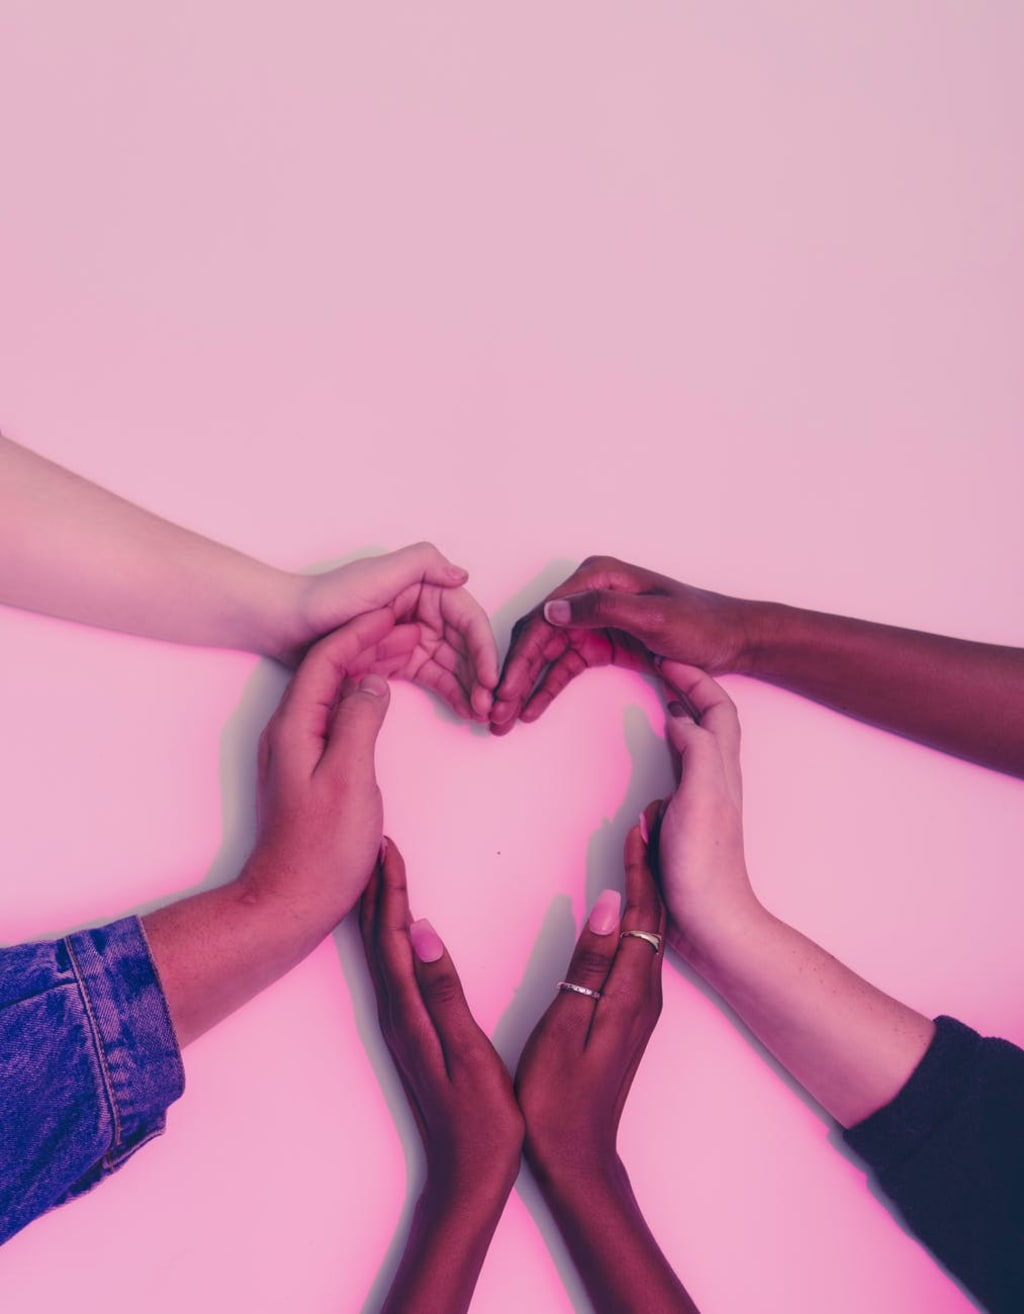 Is Love Biological Entanglement?